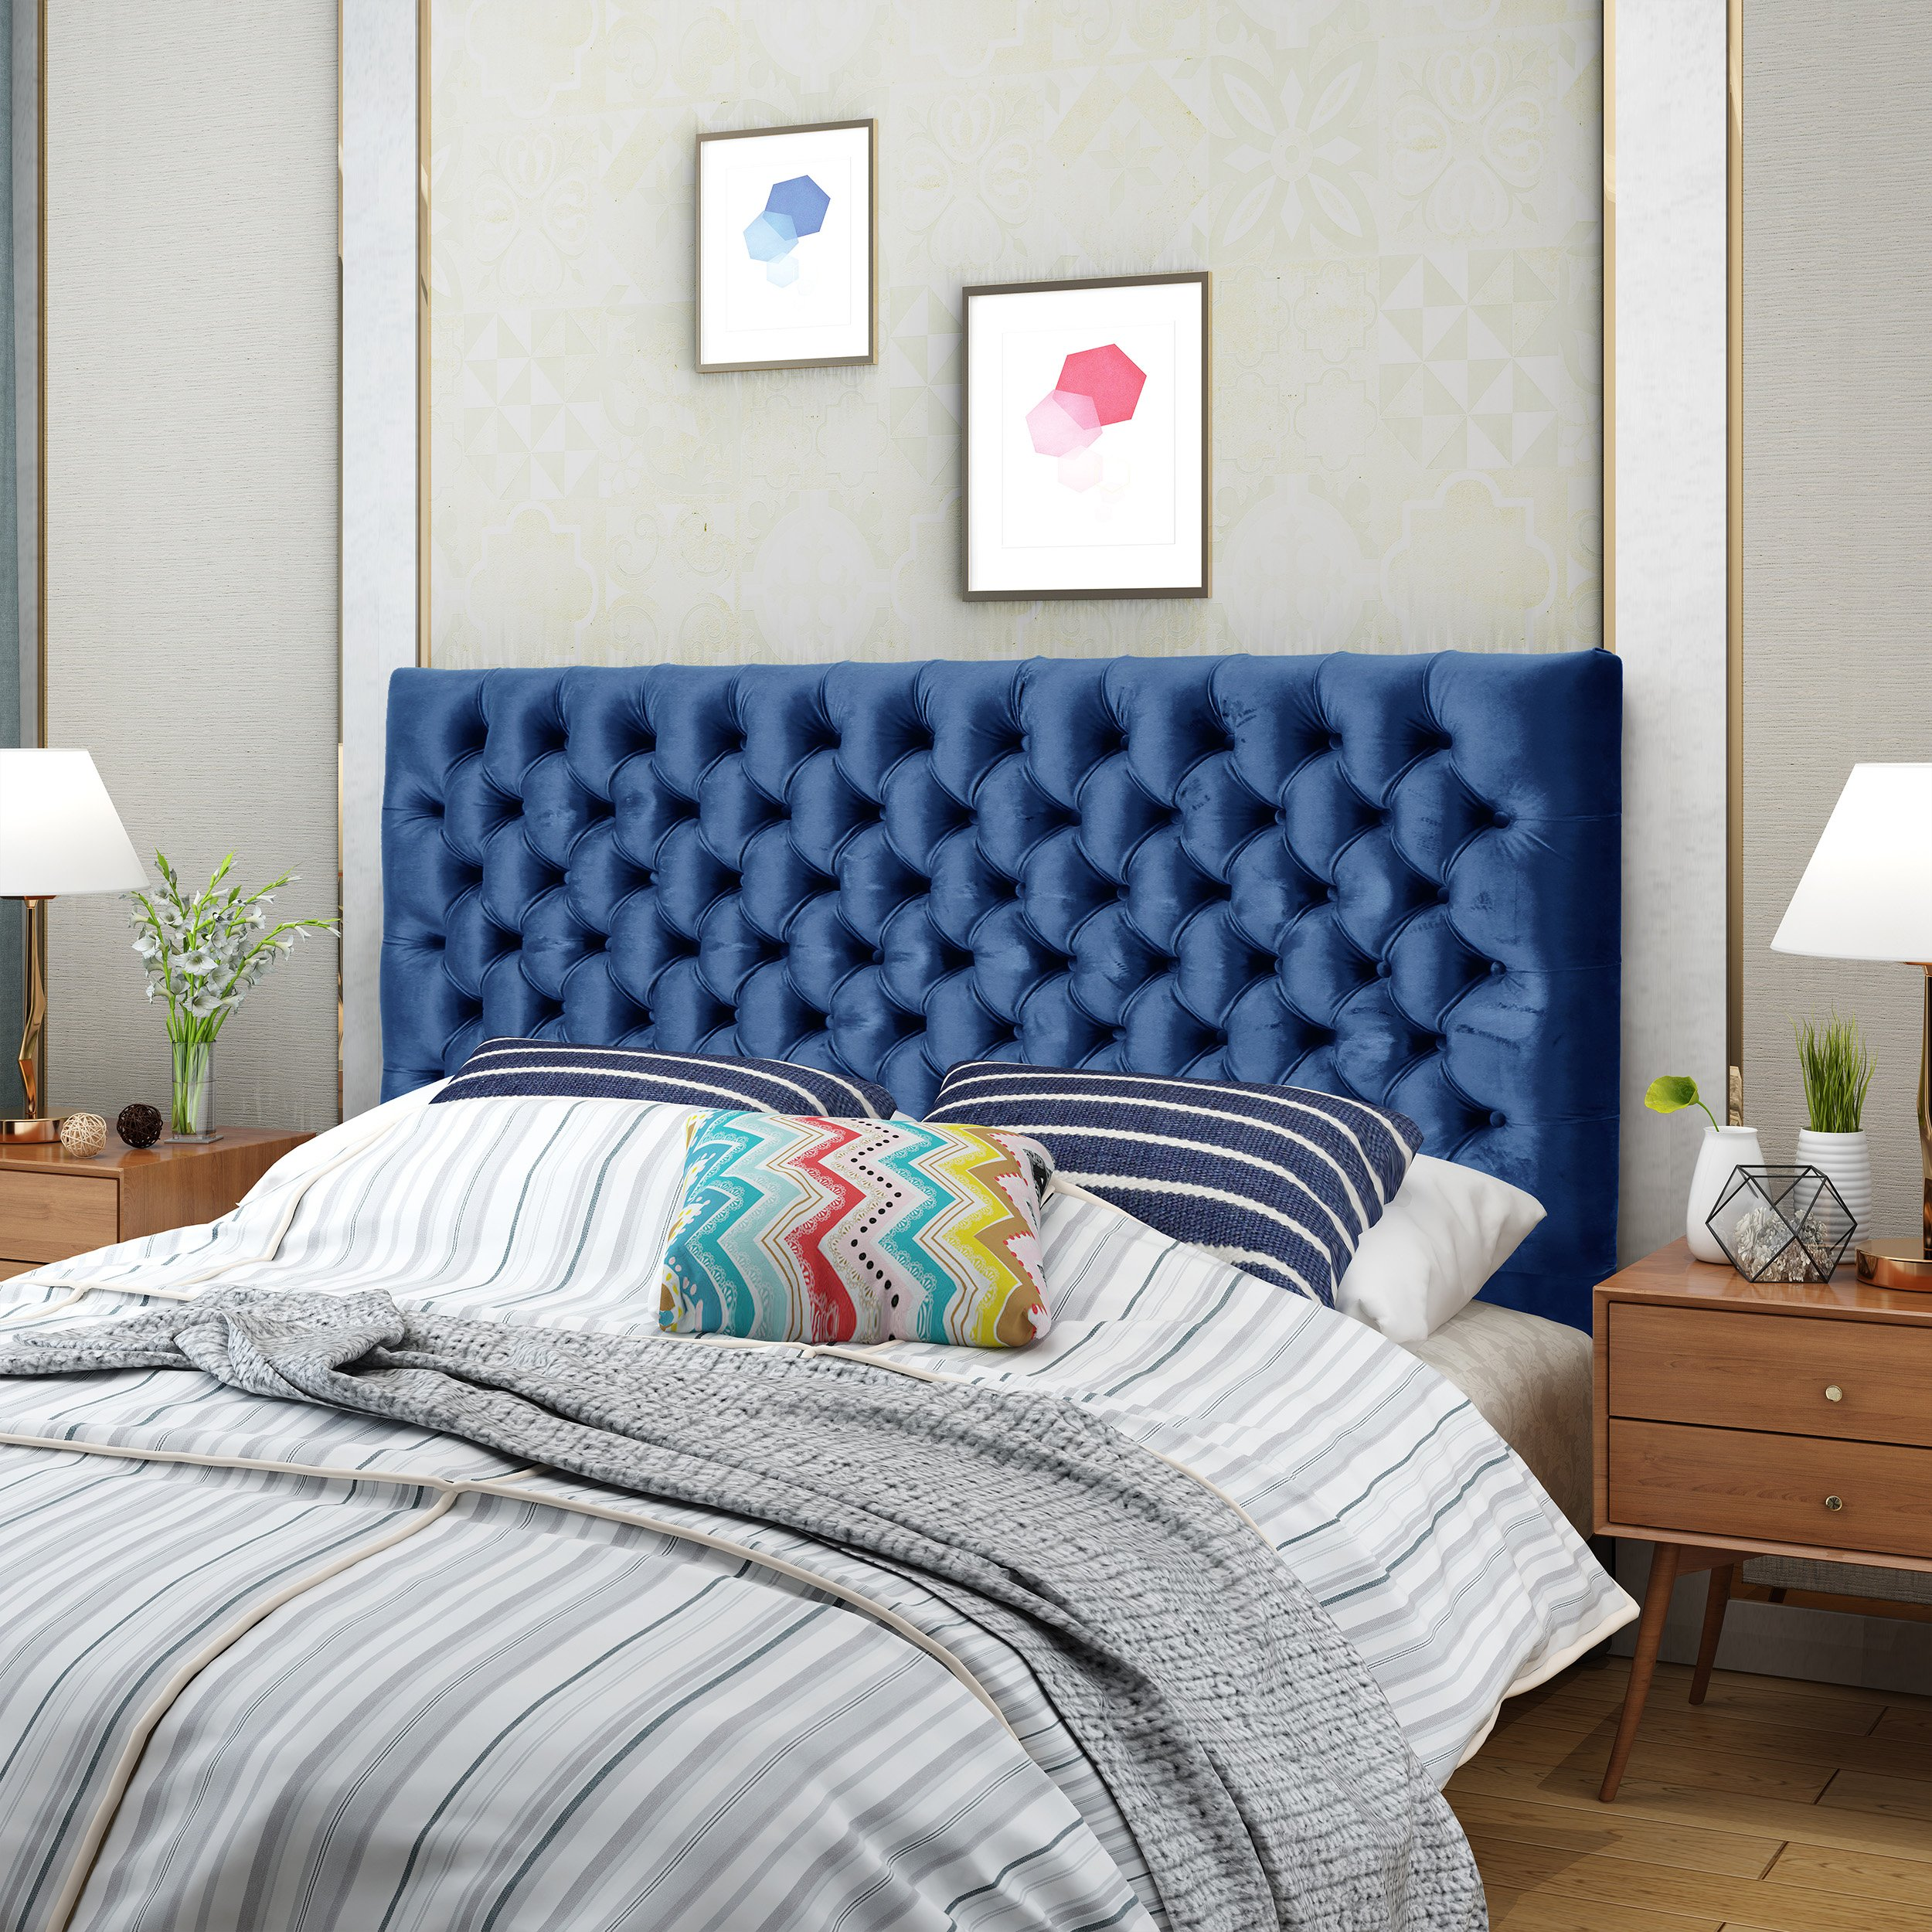 Christopher Knight Home 303582 Jezebel Headboard, Navy Blue and Black Steel by Christopher Knight Home